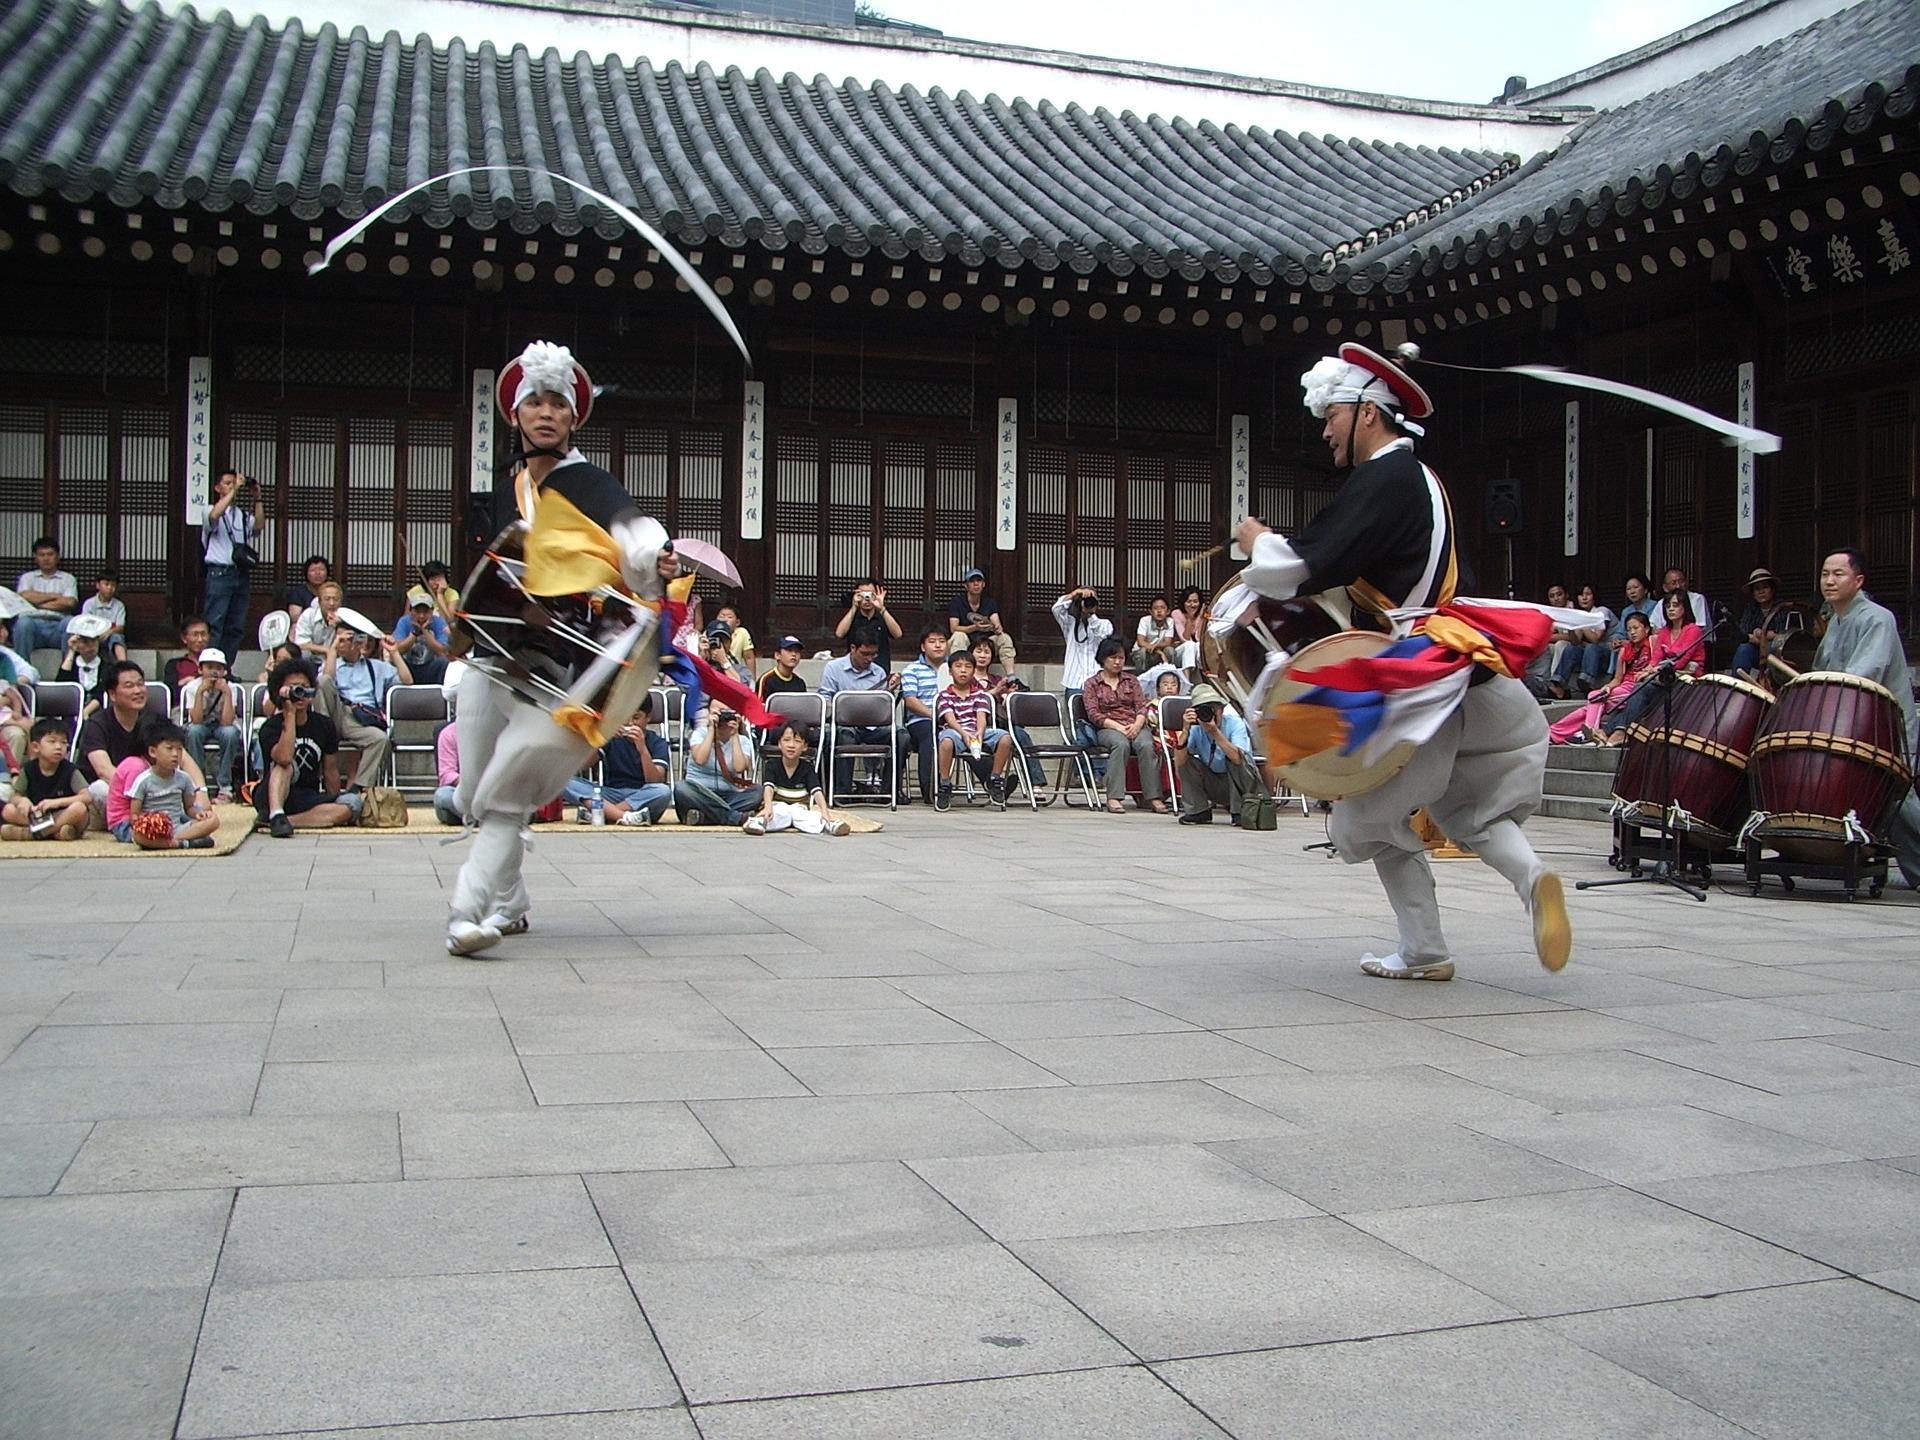 korea-71953_1920.jpg